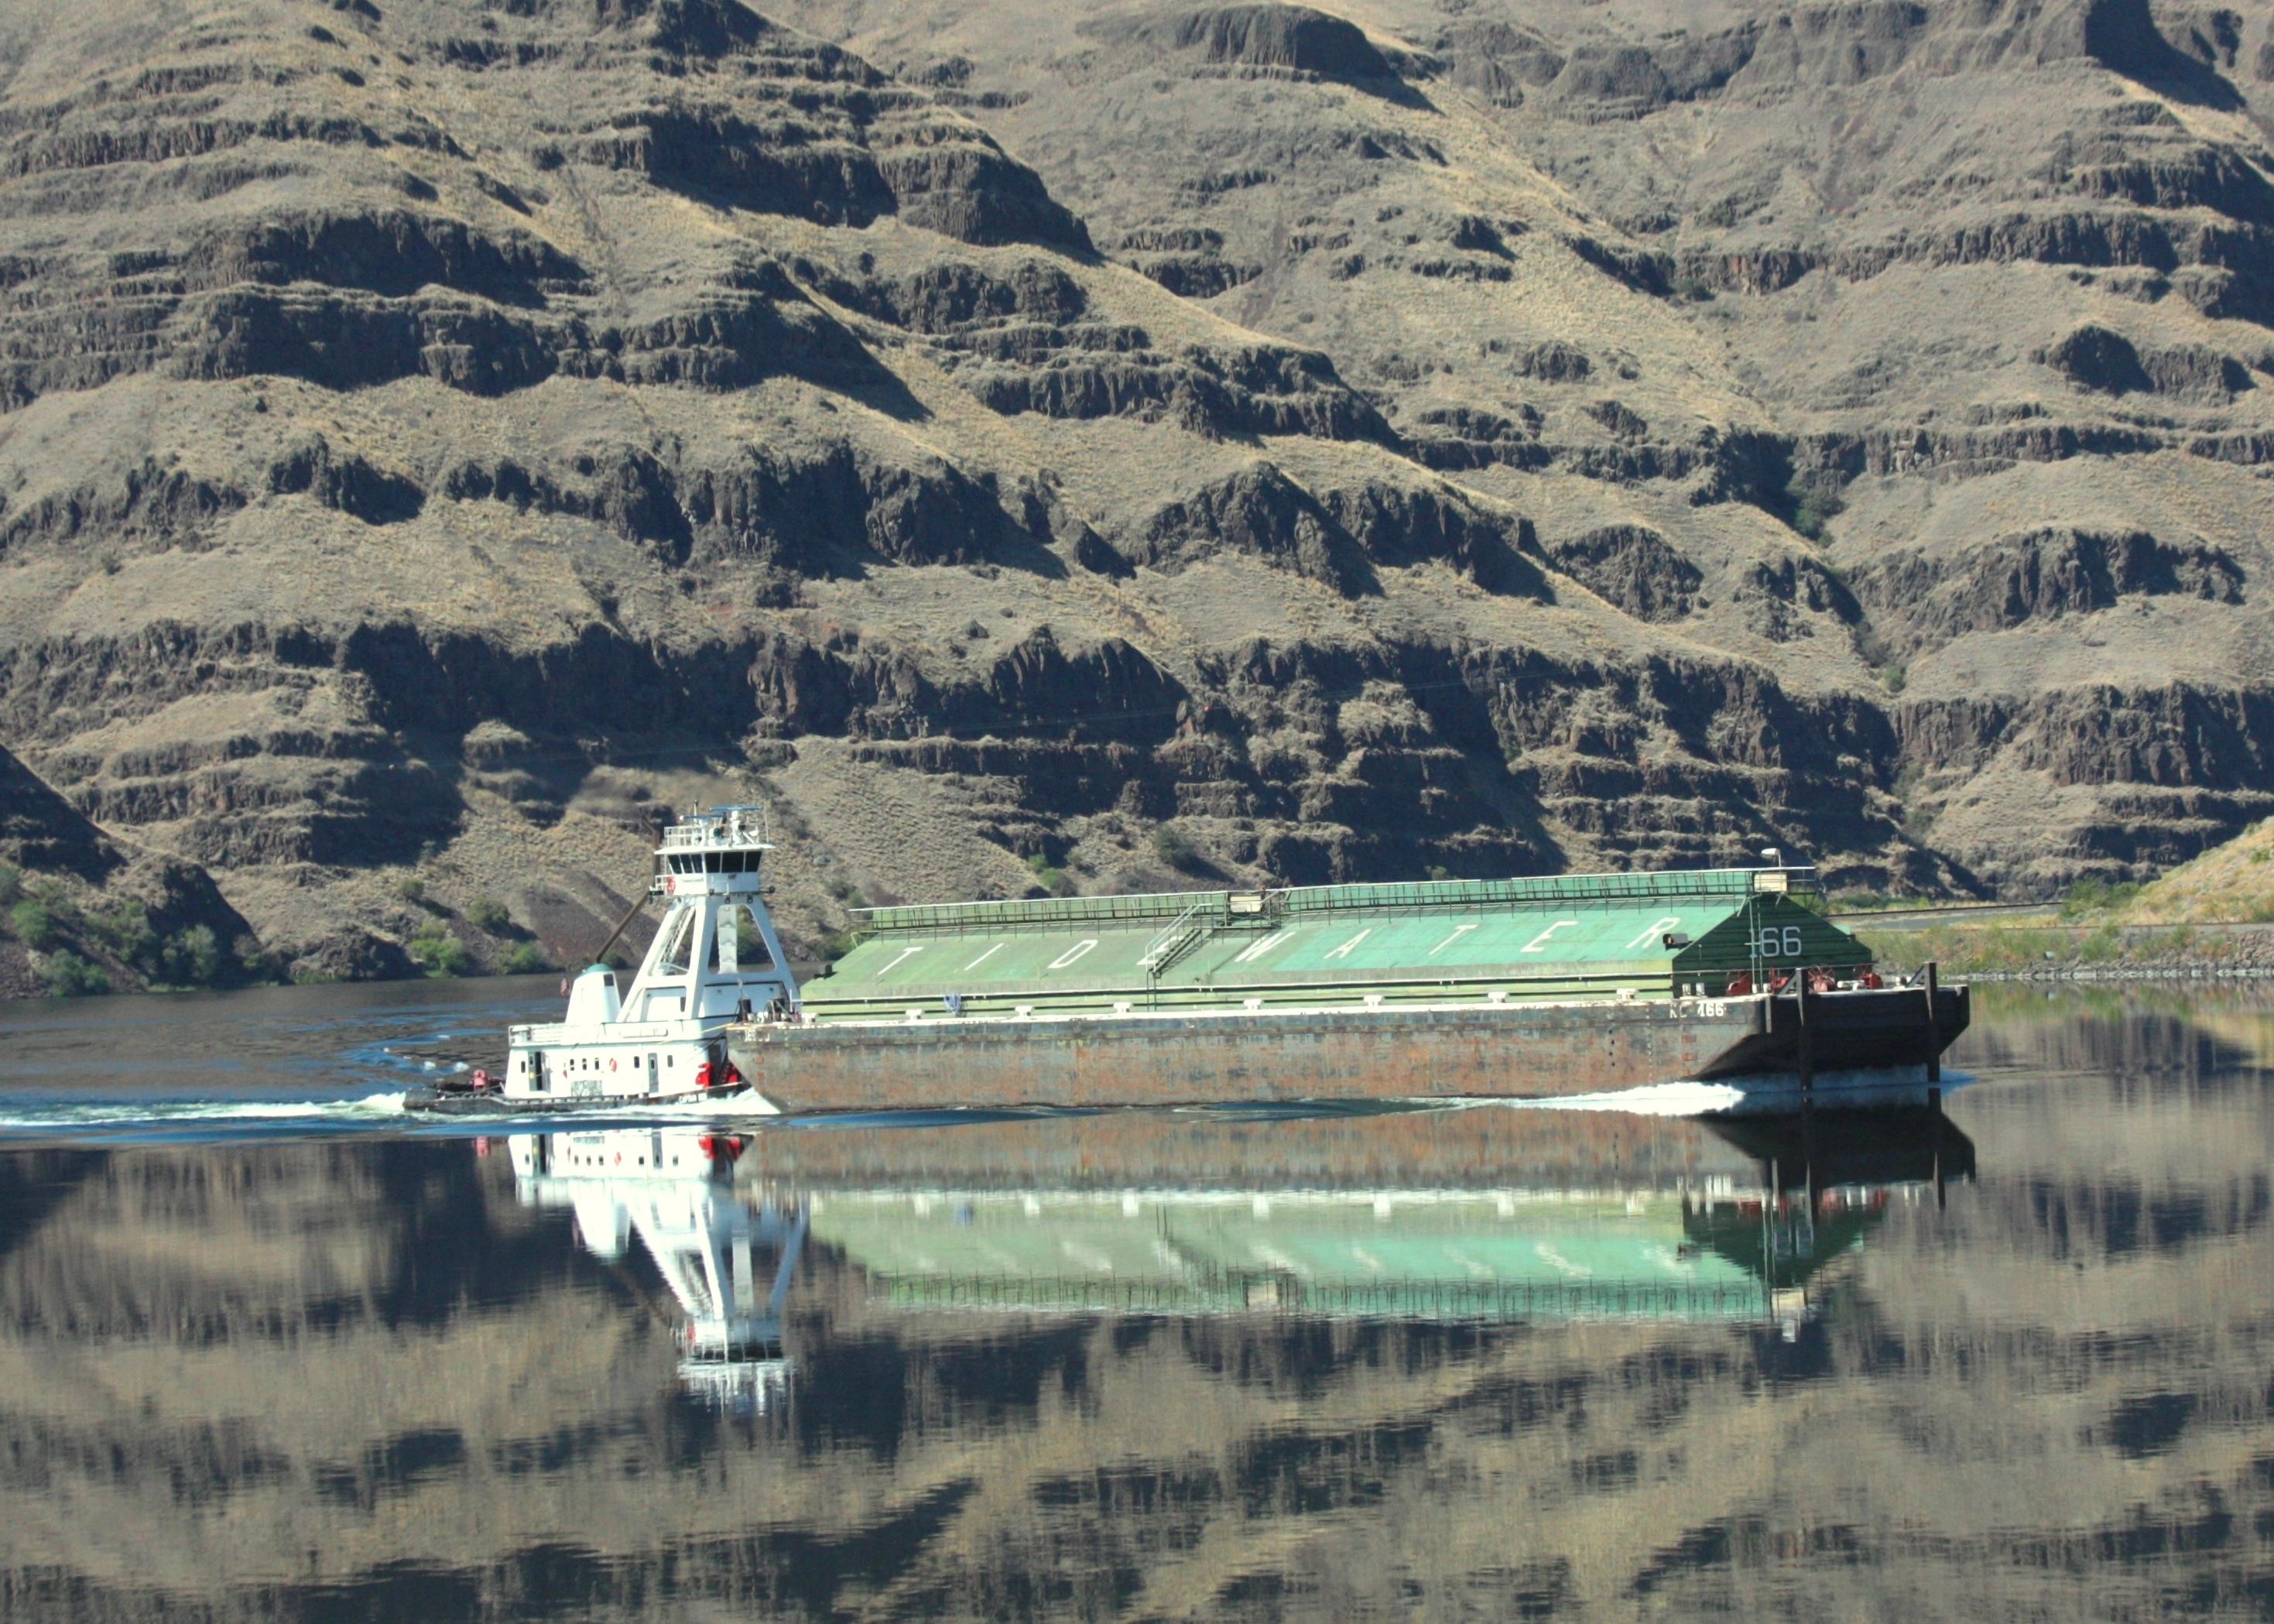 snake river tugboat and barge